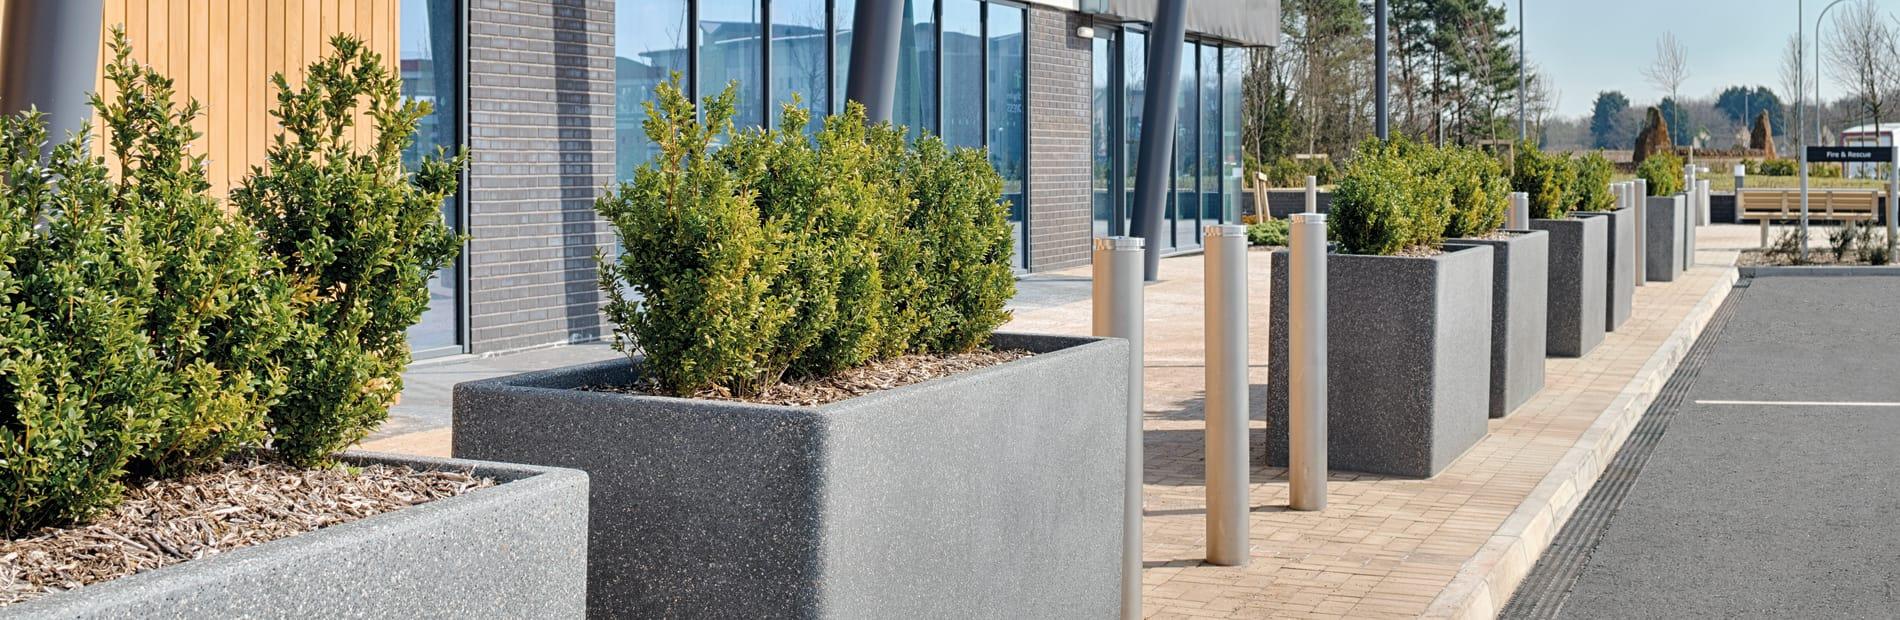 Grey Rhinoguard concrete palnters with Geo bollards